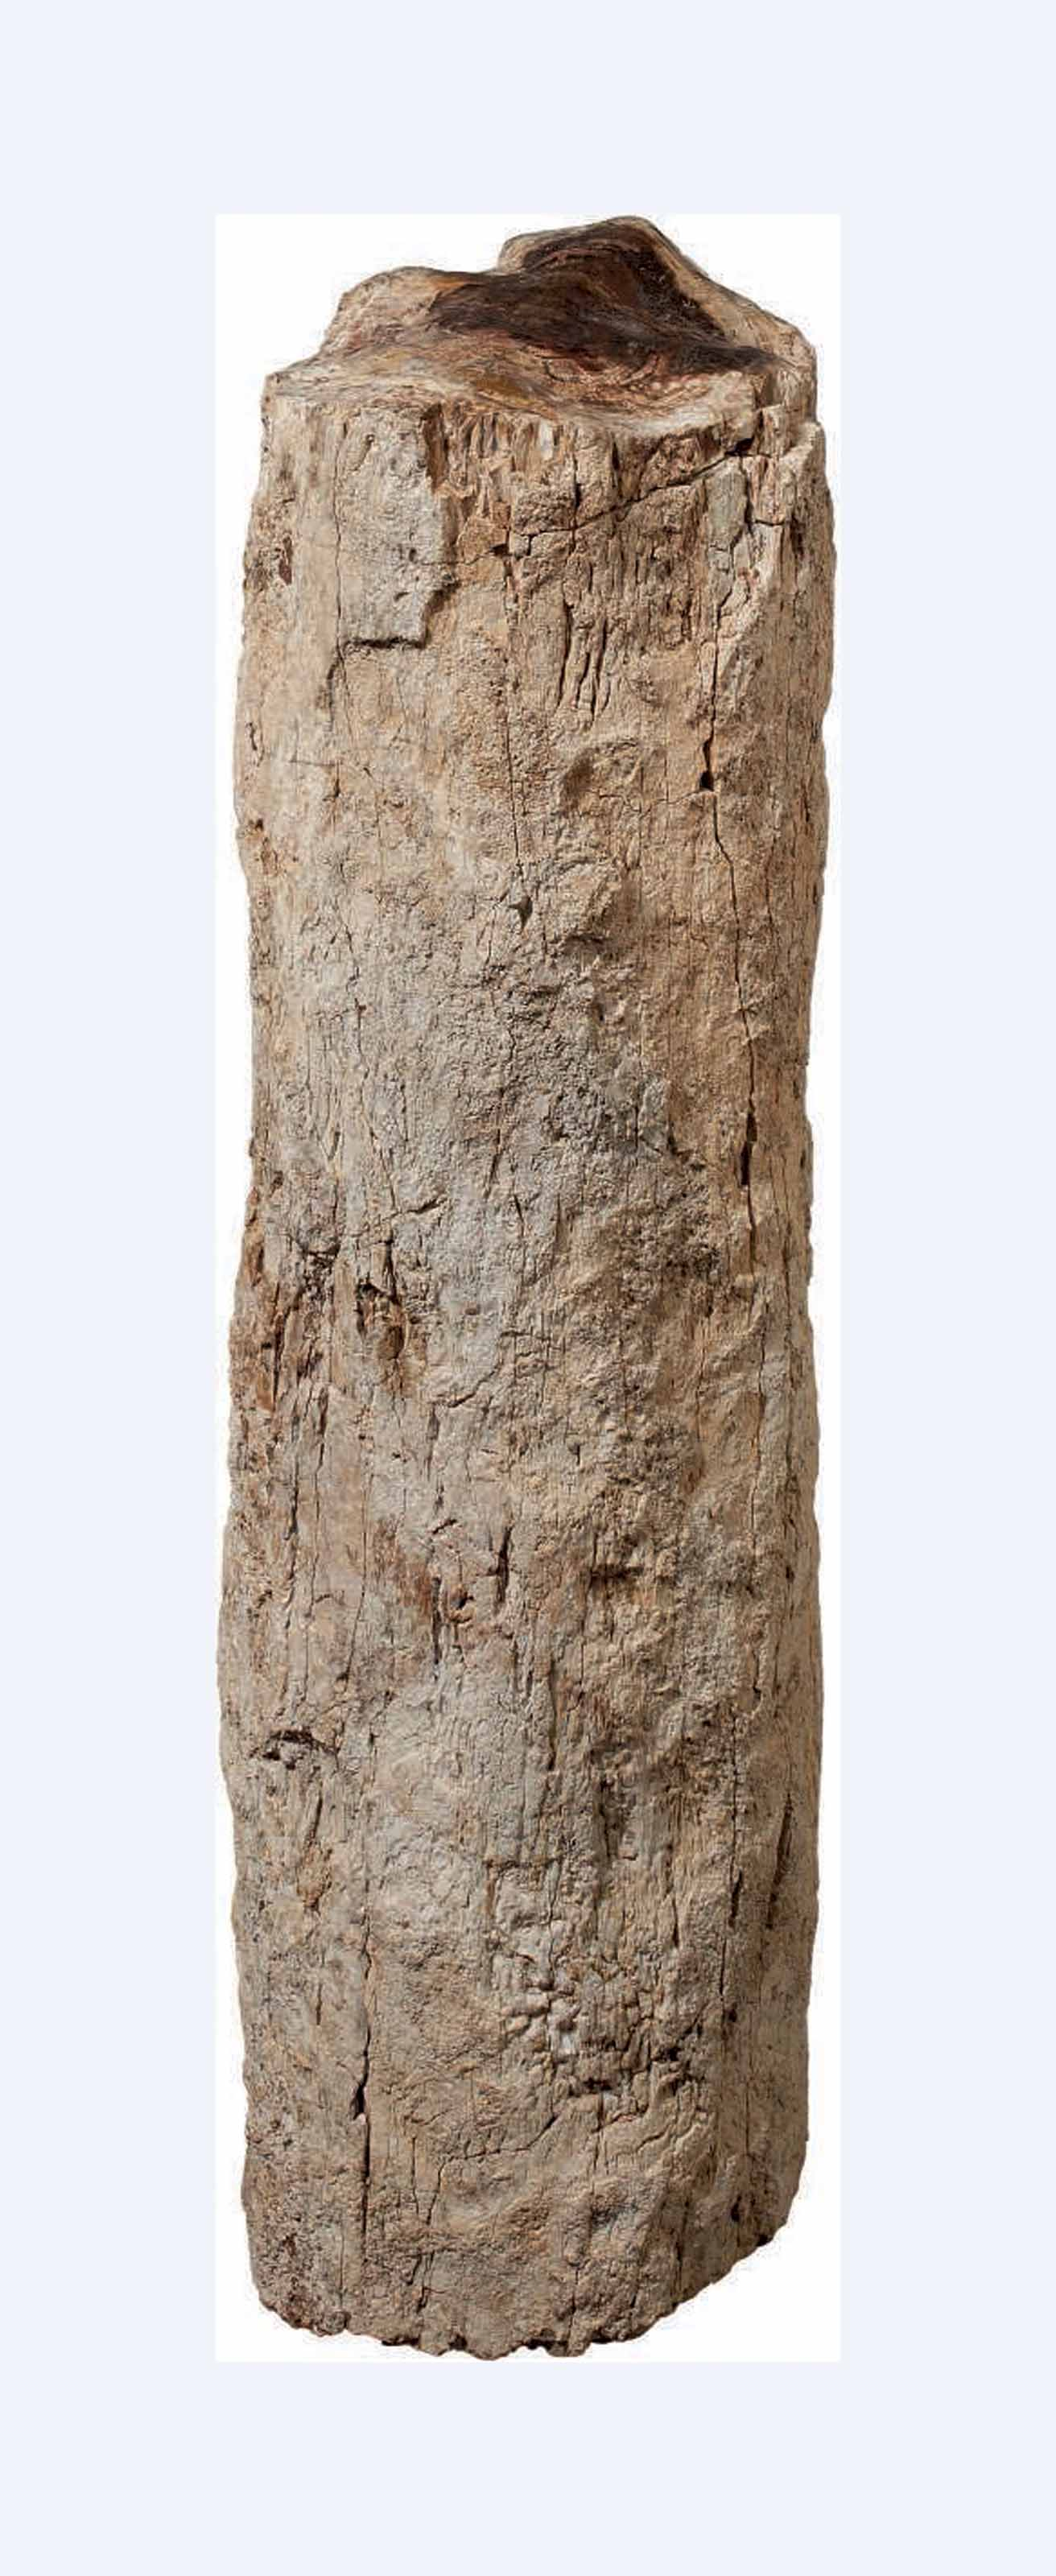 A SPECIMEN OF PETRIFIED TREE T